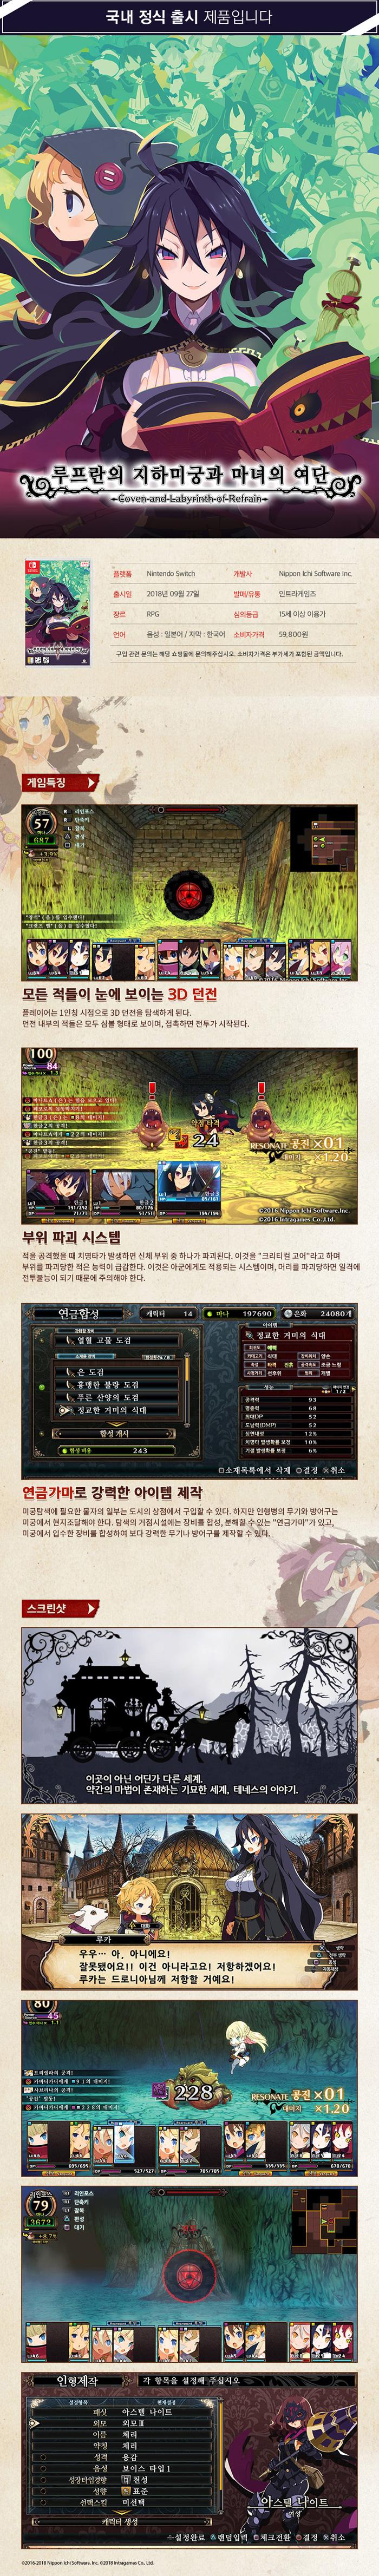 switch 루프란의 지하미궁과 마녀의 여단 상세페이지